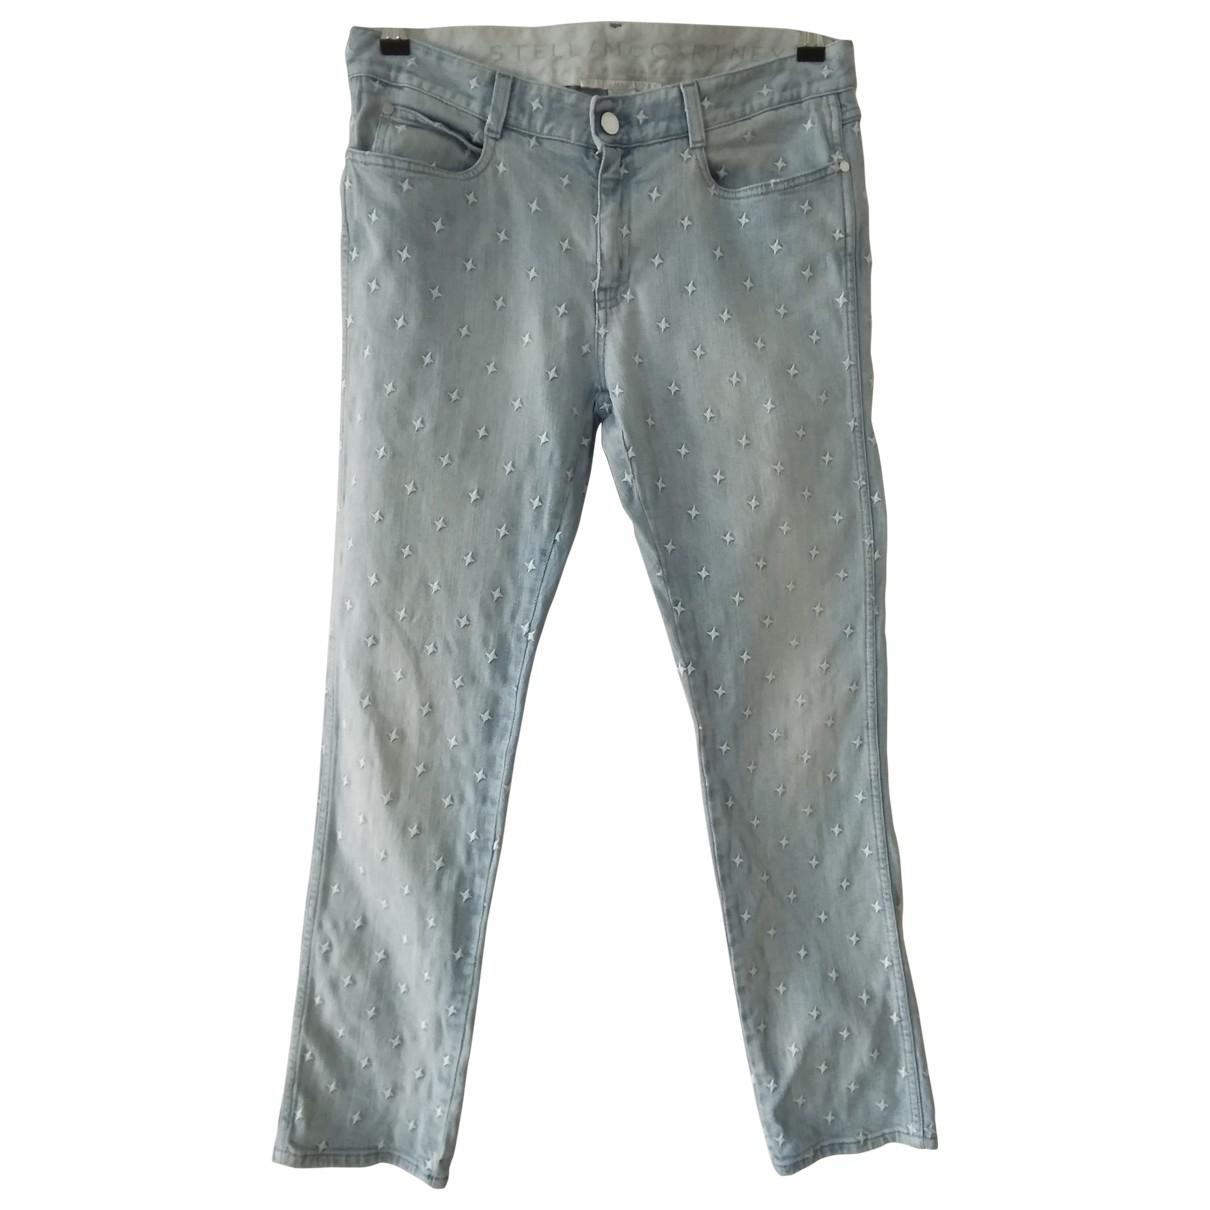 Stella Mccartney N Blue Cotton Jeans for Women 30 US